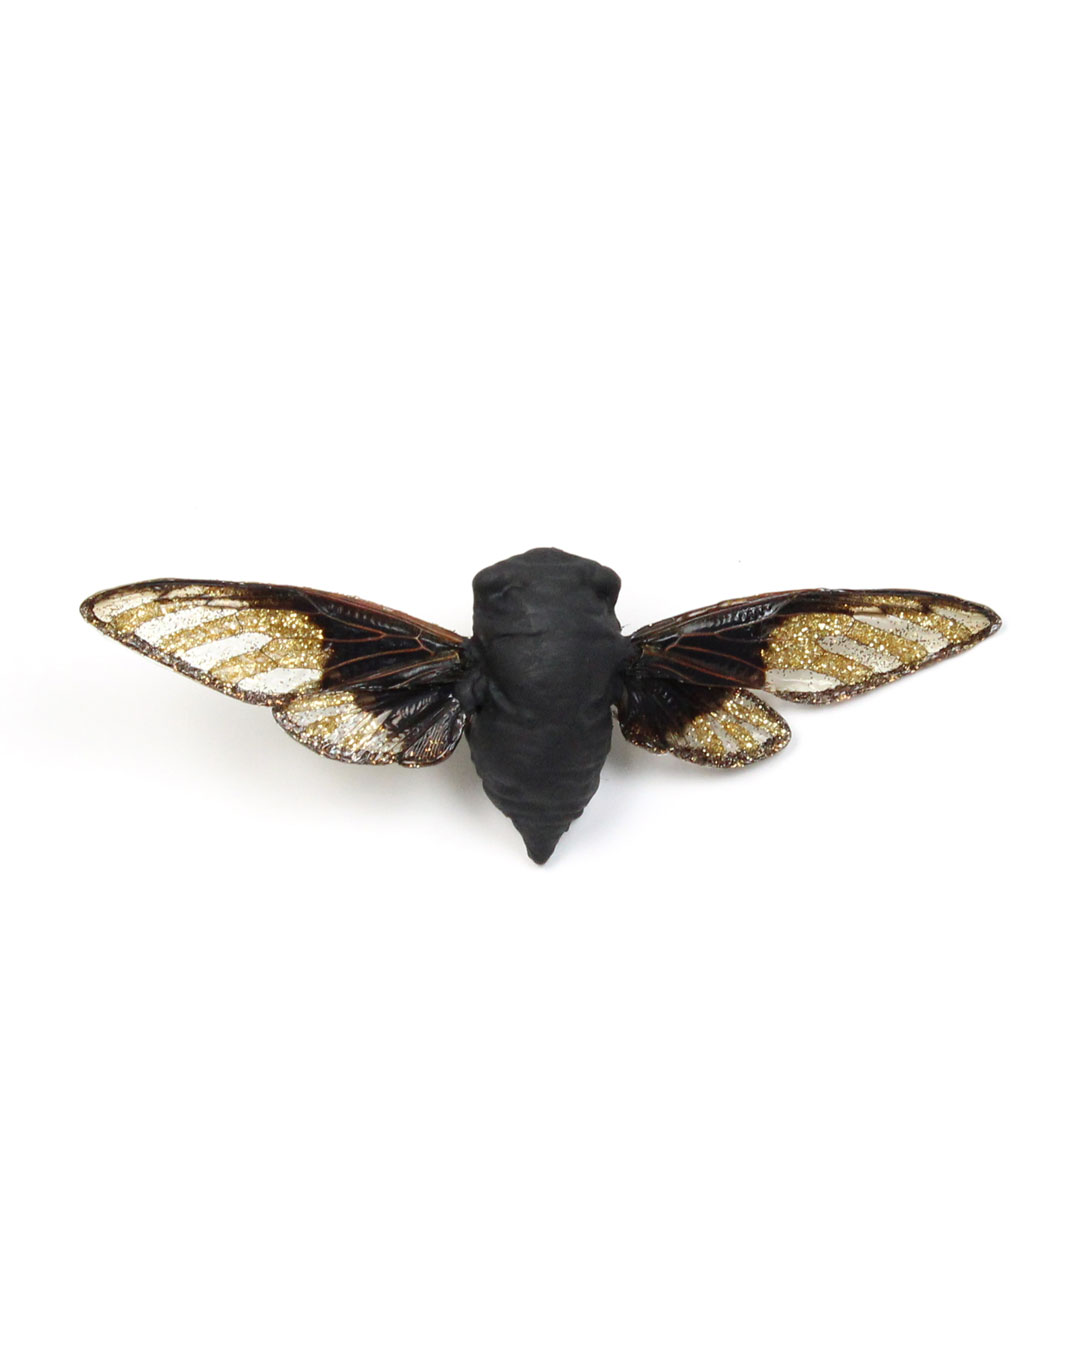 Märta Mattsson, Wings, 2016, broche; cicade, koper, lak, hars, pigment, zilver, 140 x 70 x 30 mm, €1100